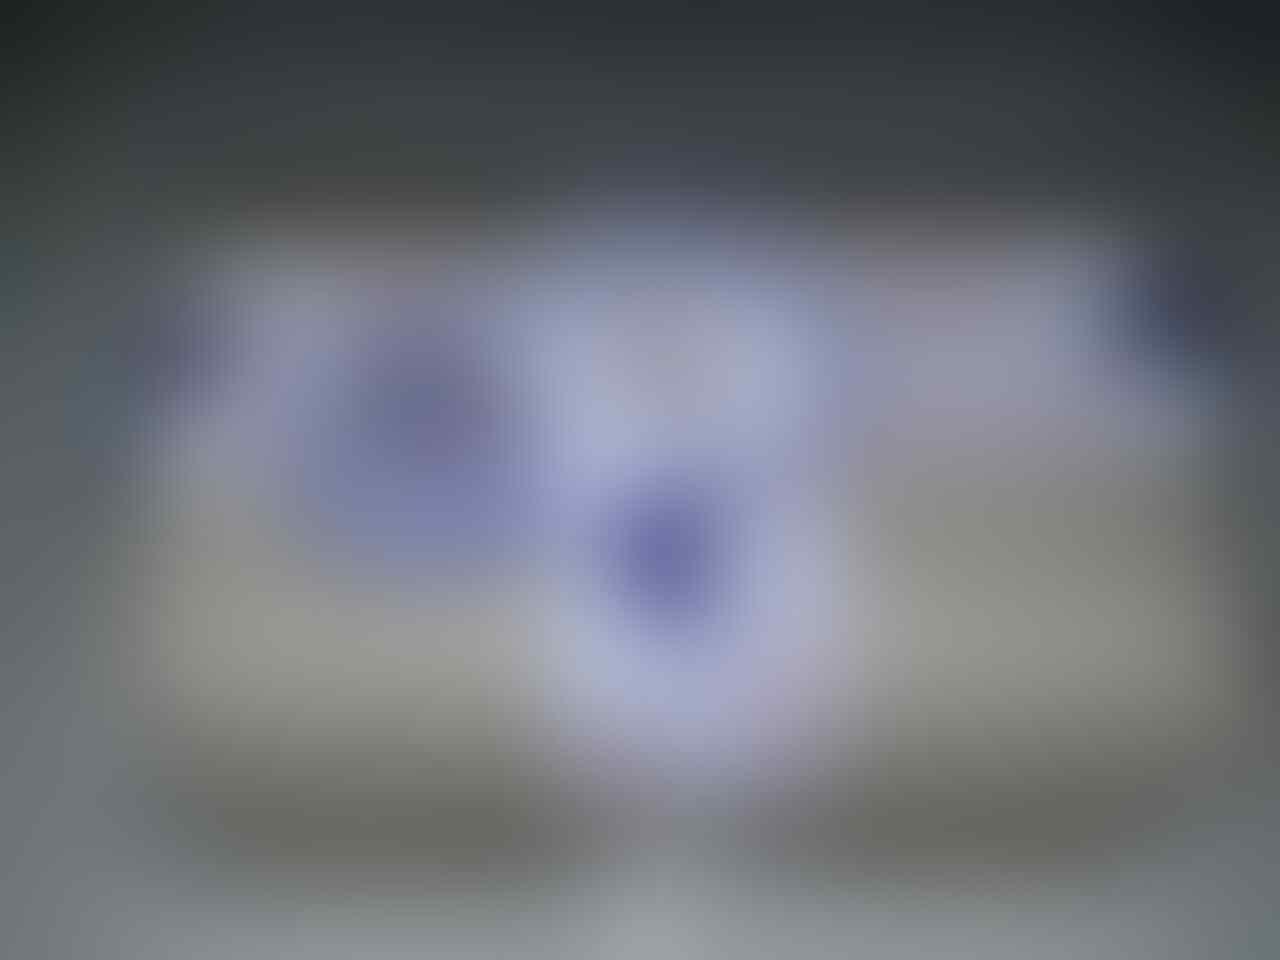 iphone 4 white 16gb gsm fu mulus murah lengkap [bandung]